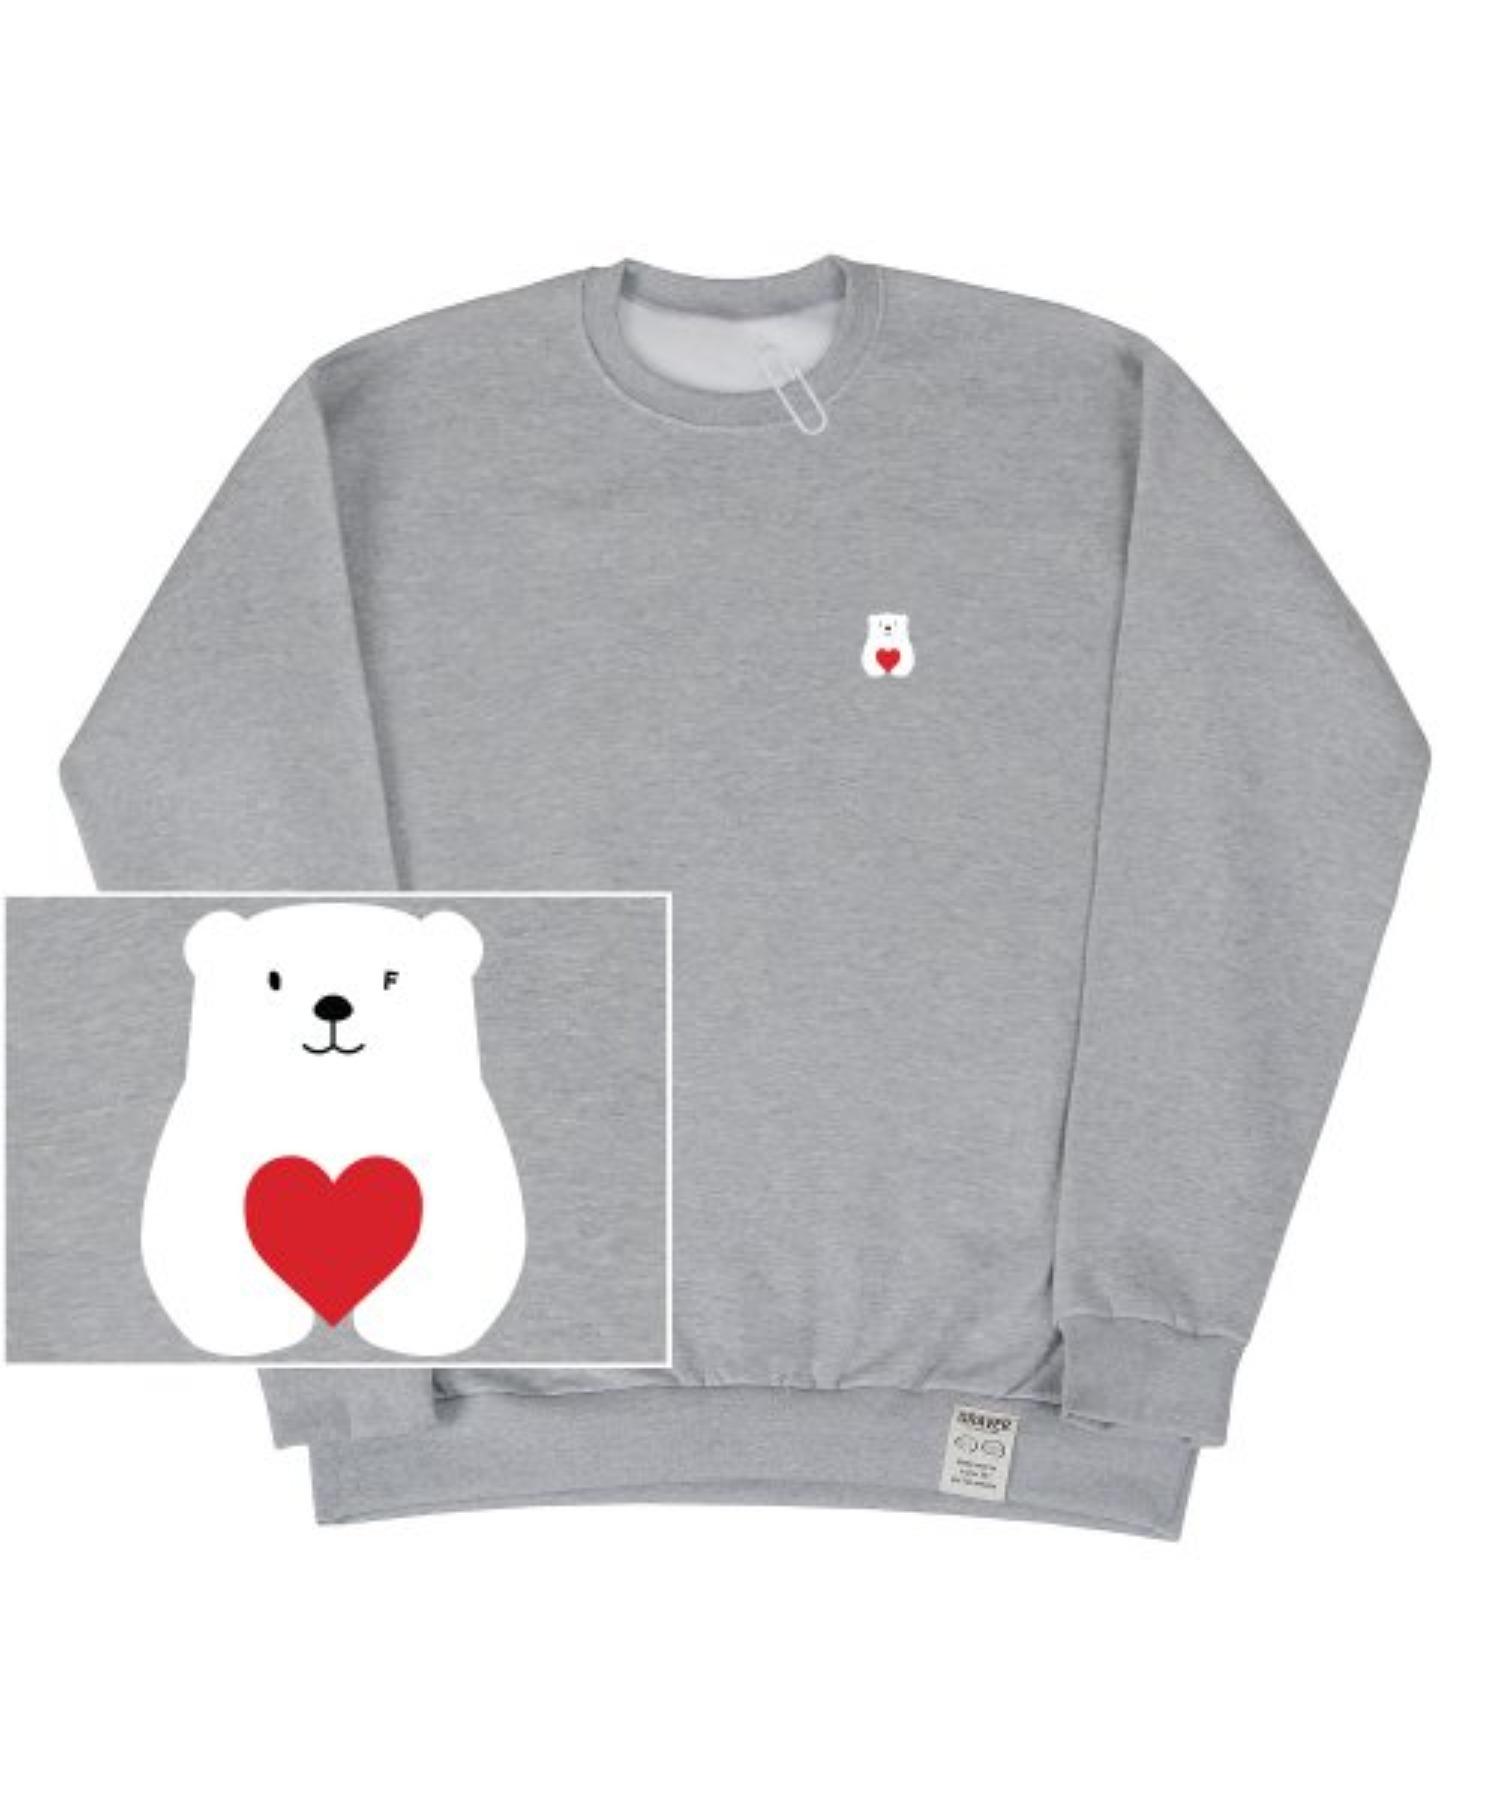 [UNISEX] Small Polar Bear Red Heart White Clip Sweatshirt_Gray